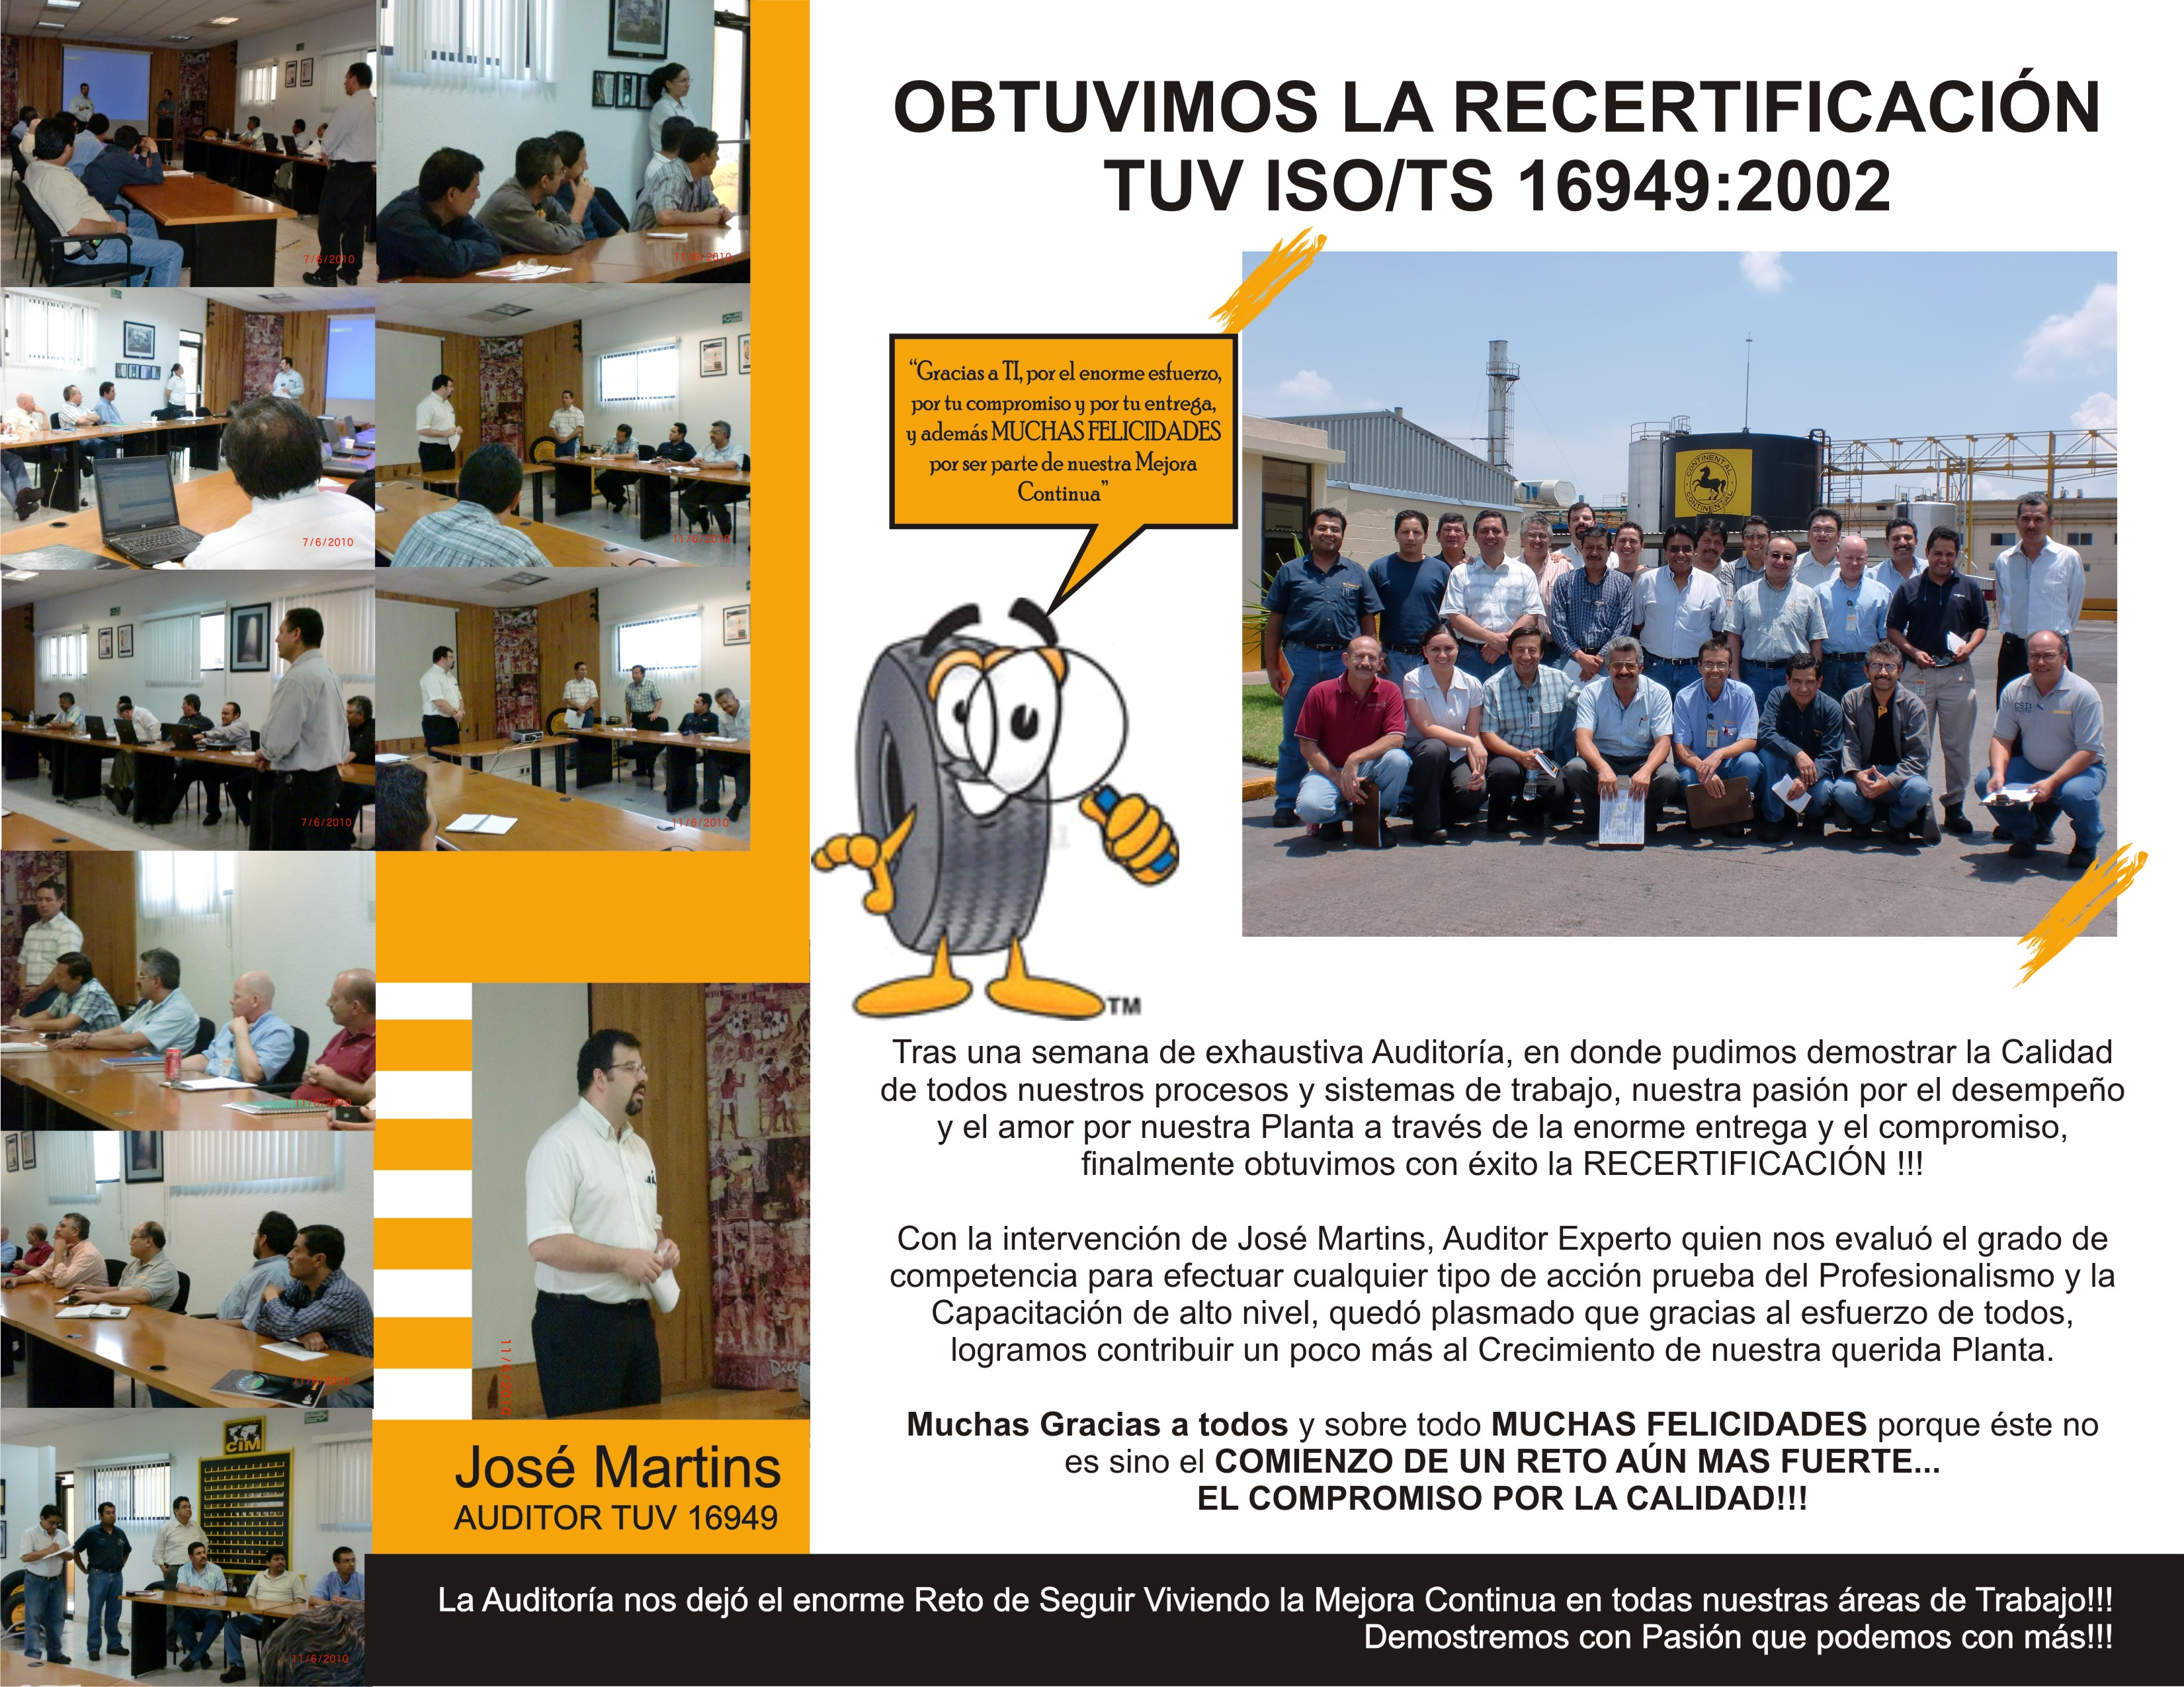 CartelRecertificación_TUV_2010[1]